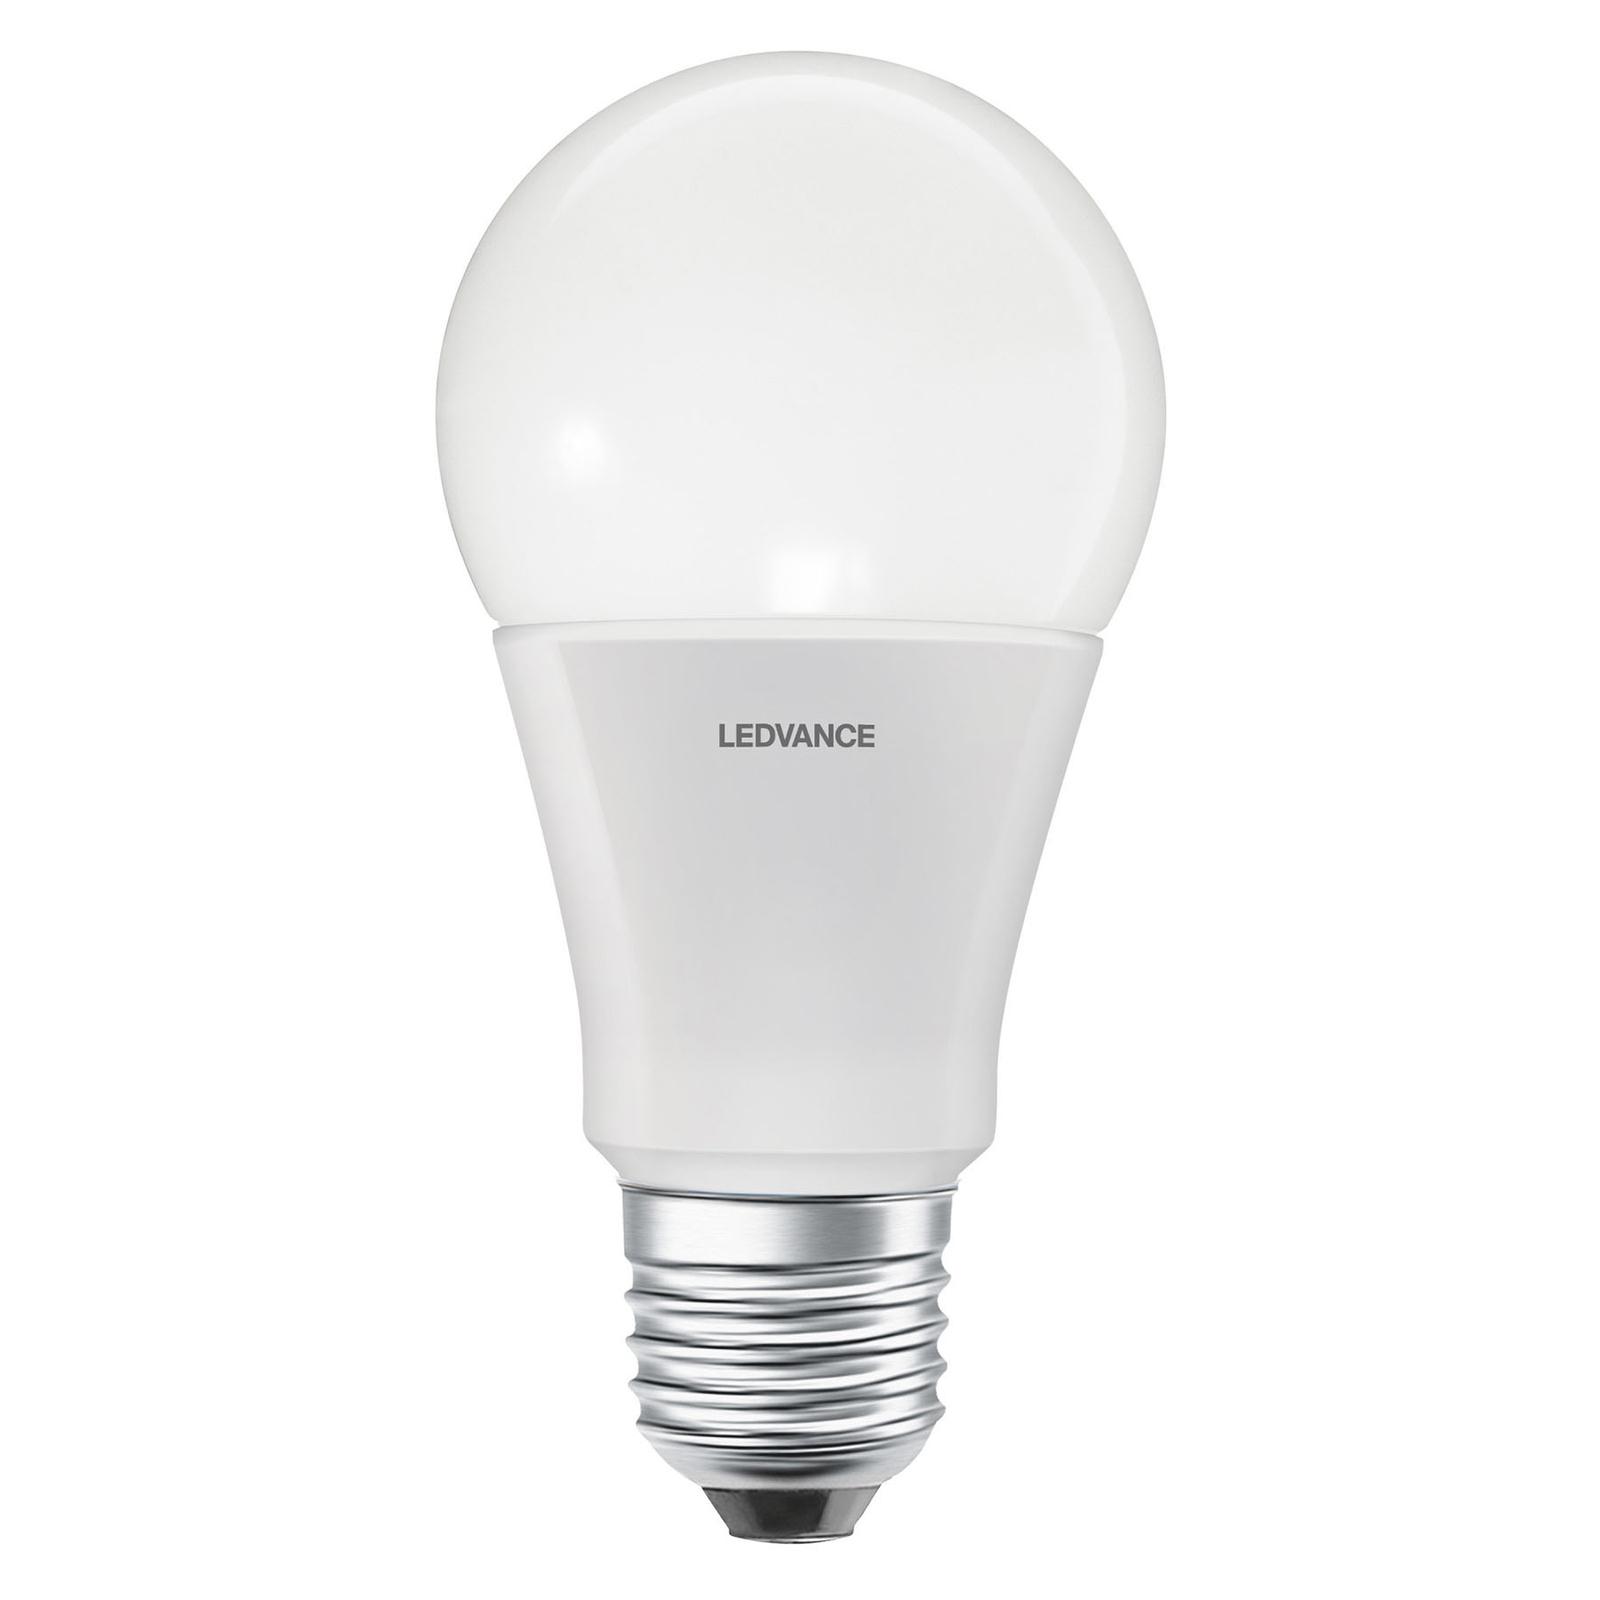 LEDVANCE SMART+ WiFi E27 14W Classic 2700K